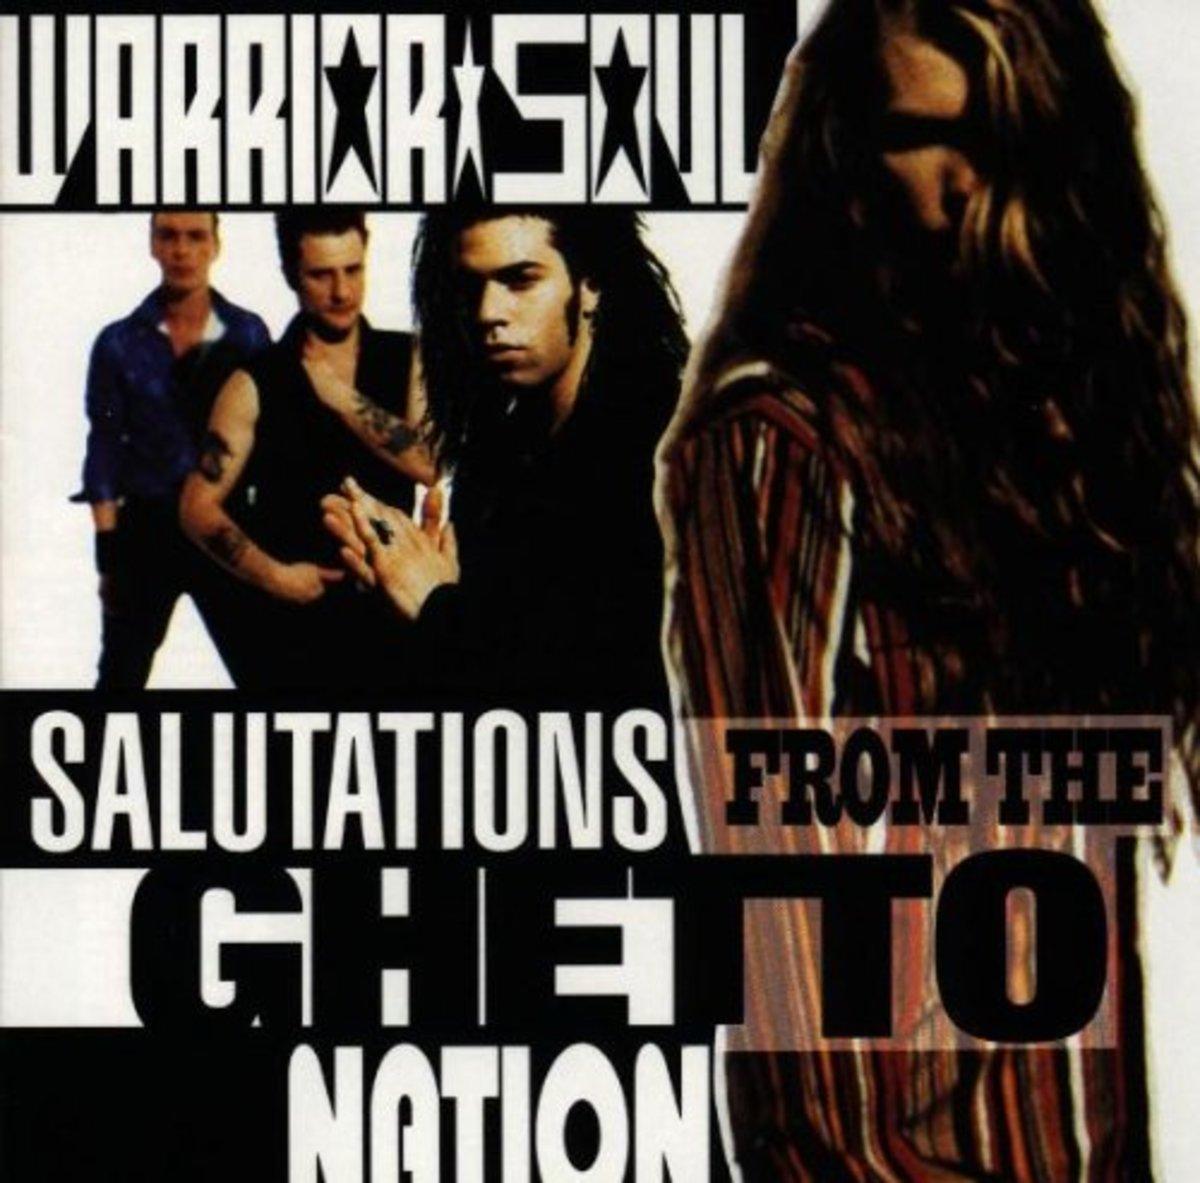 Warrior Soul,